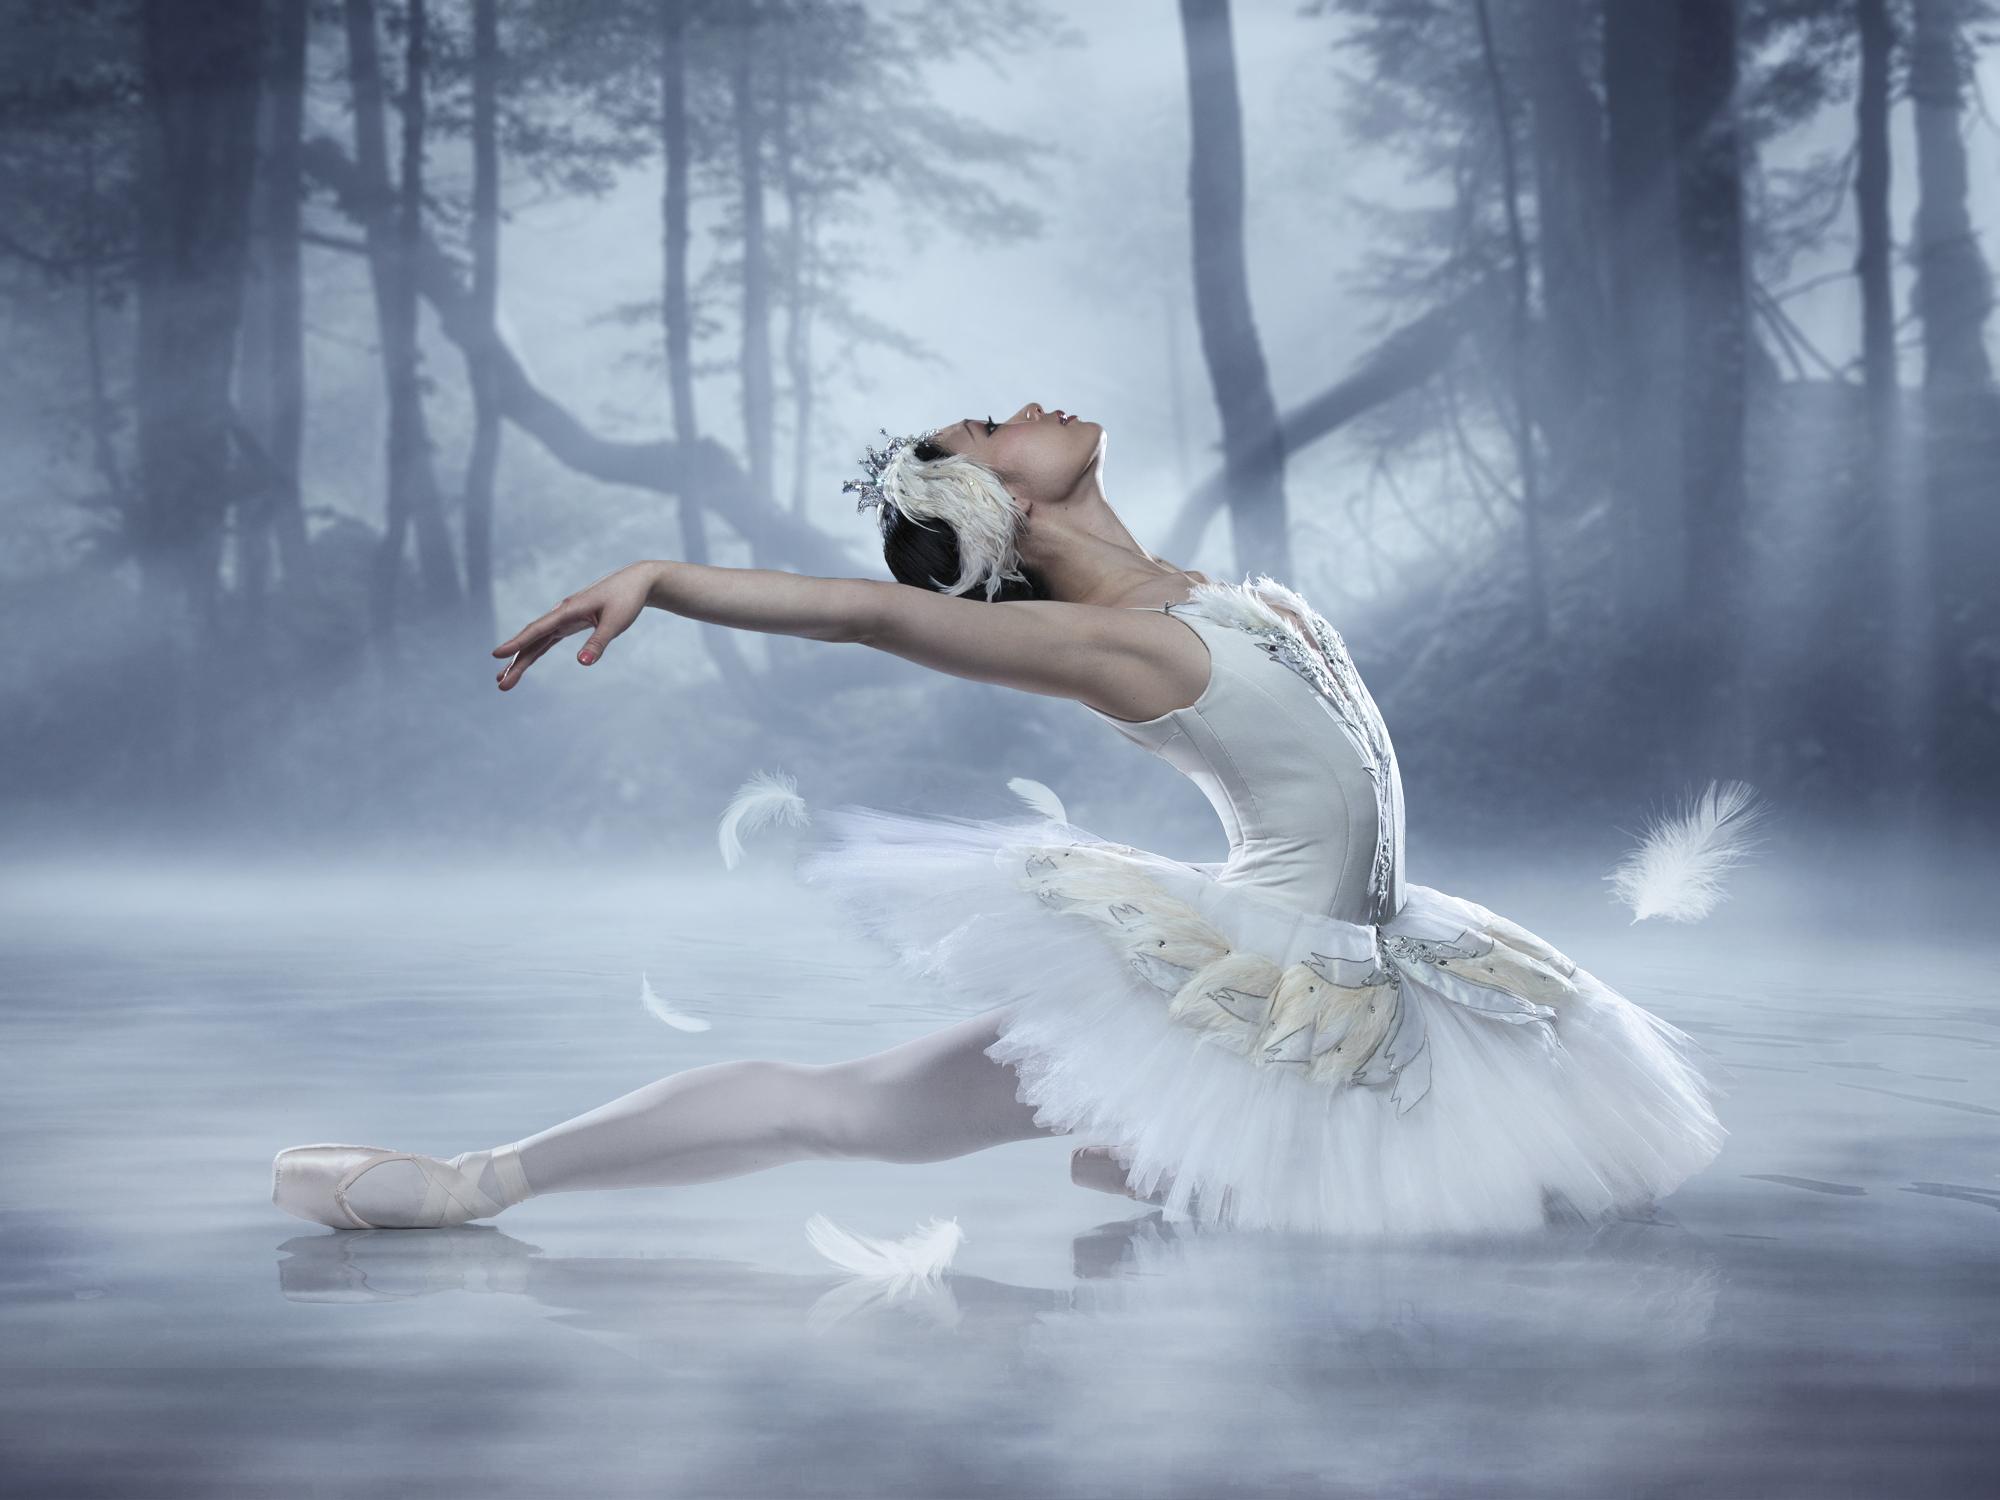 RWB Company Dancer Sophia Lee, 2015. Photo Credit: Rejean Brandt